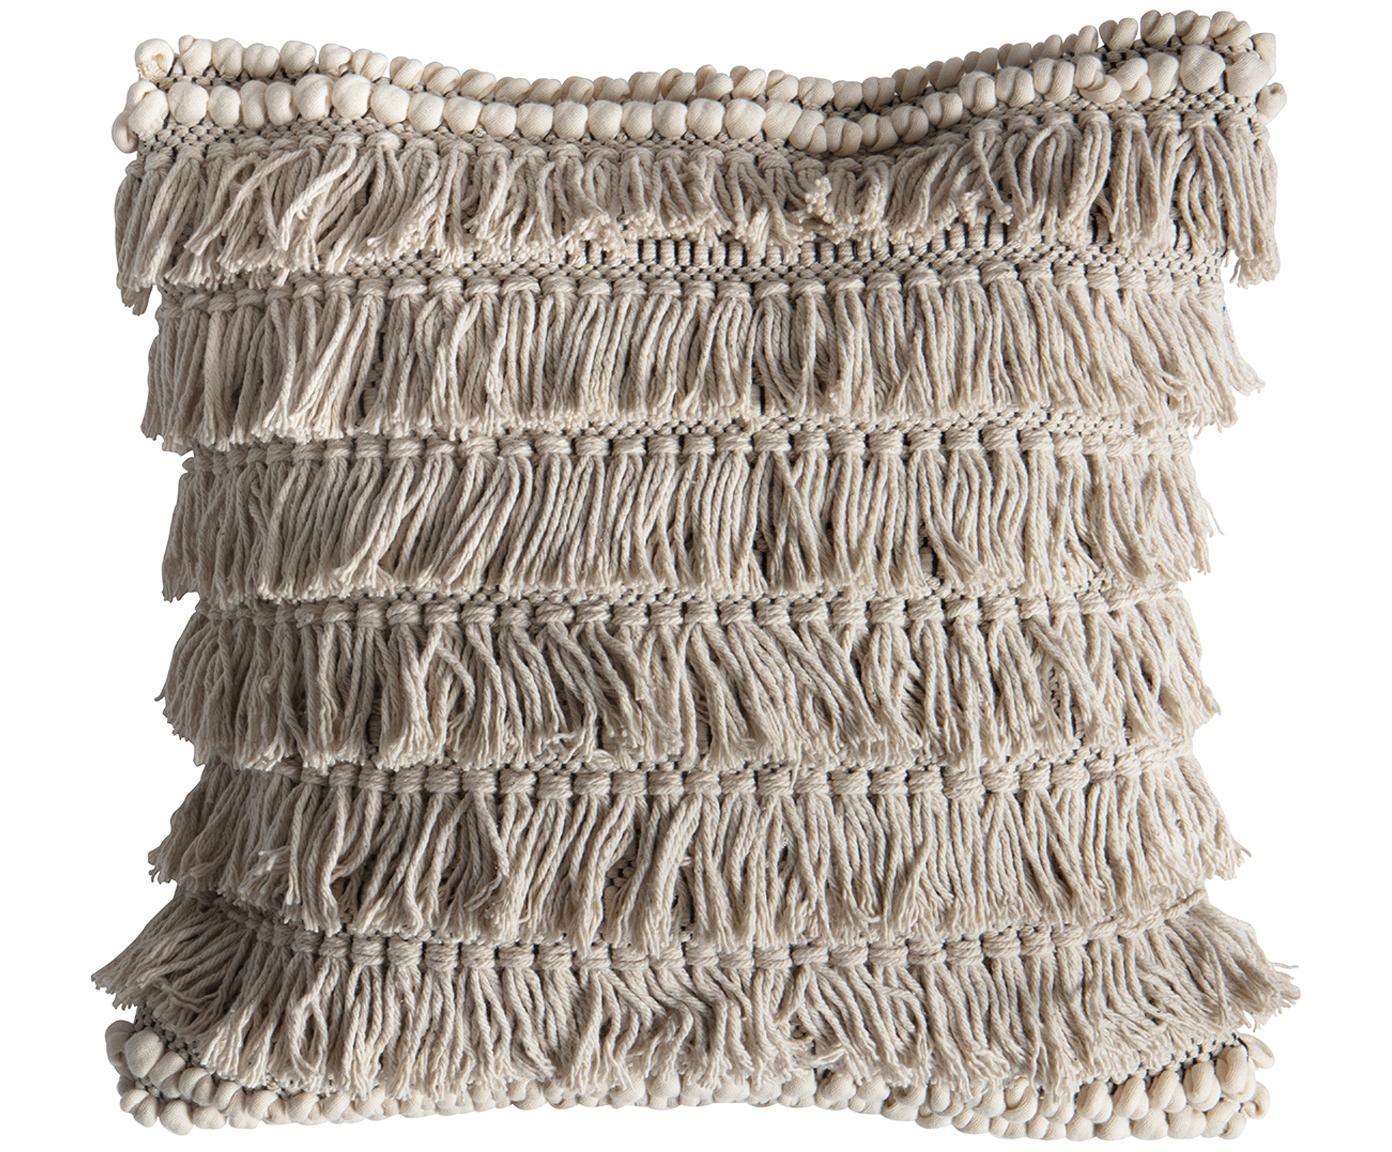 Cuscino con imbottitura Tallara, Rivestimento: 100% cotone riciclato, Color crema, Larg. 45 x Lung. 45 cm